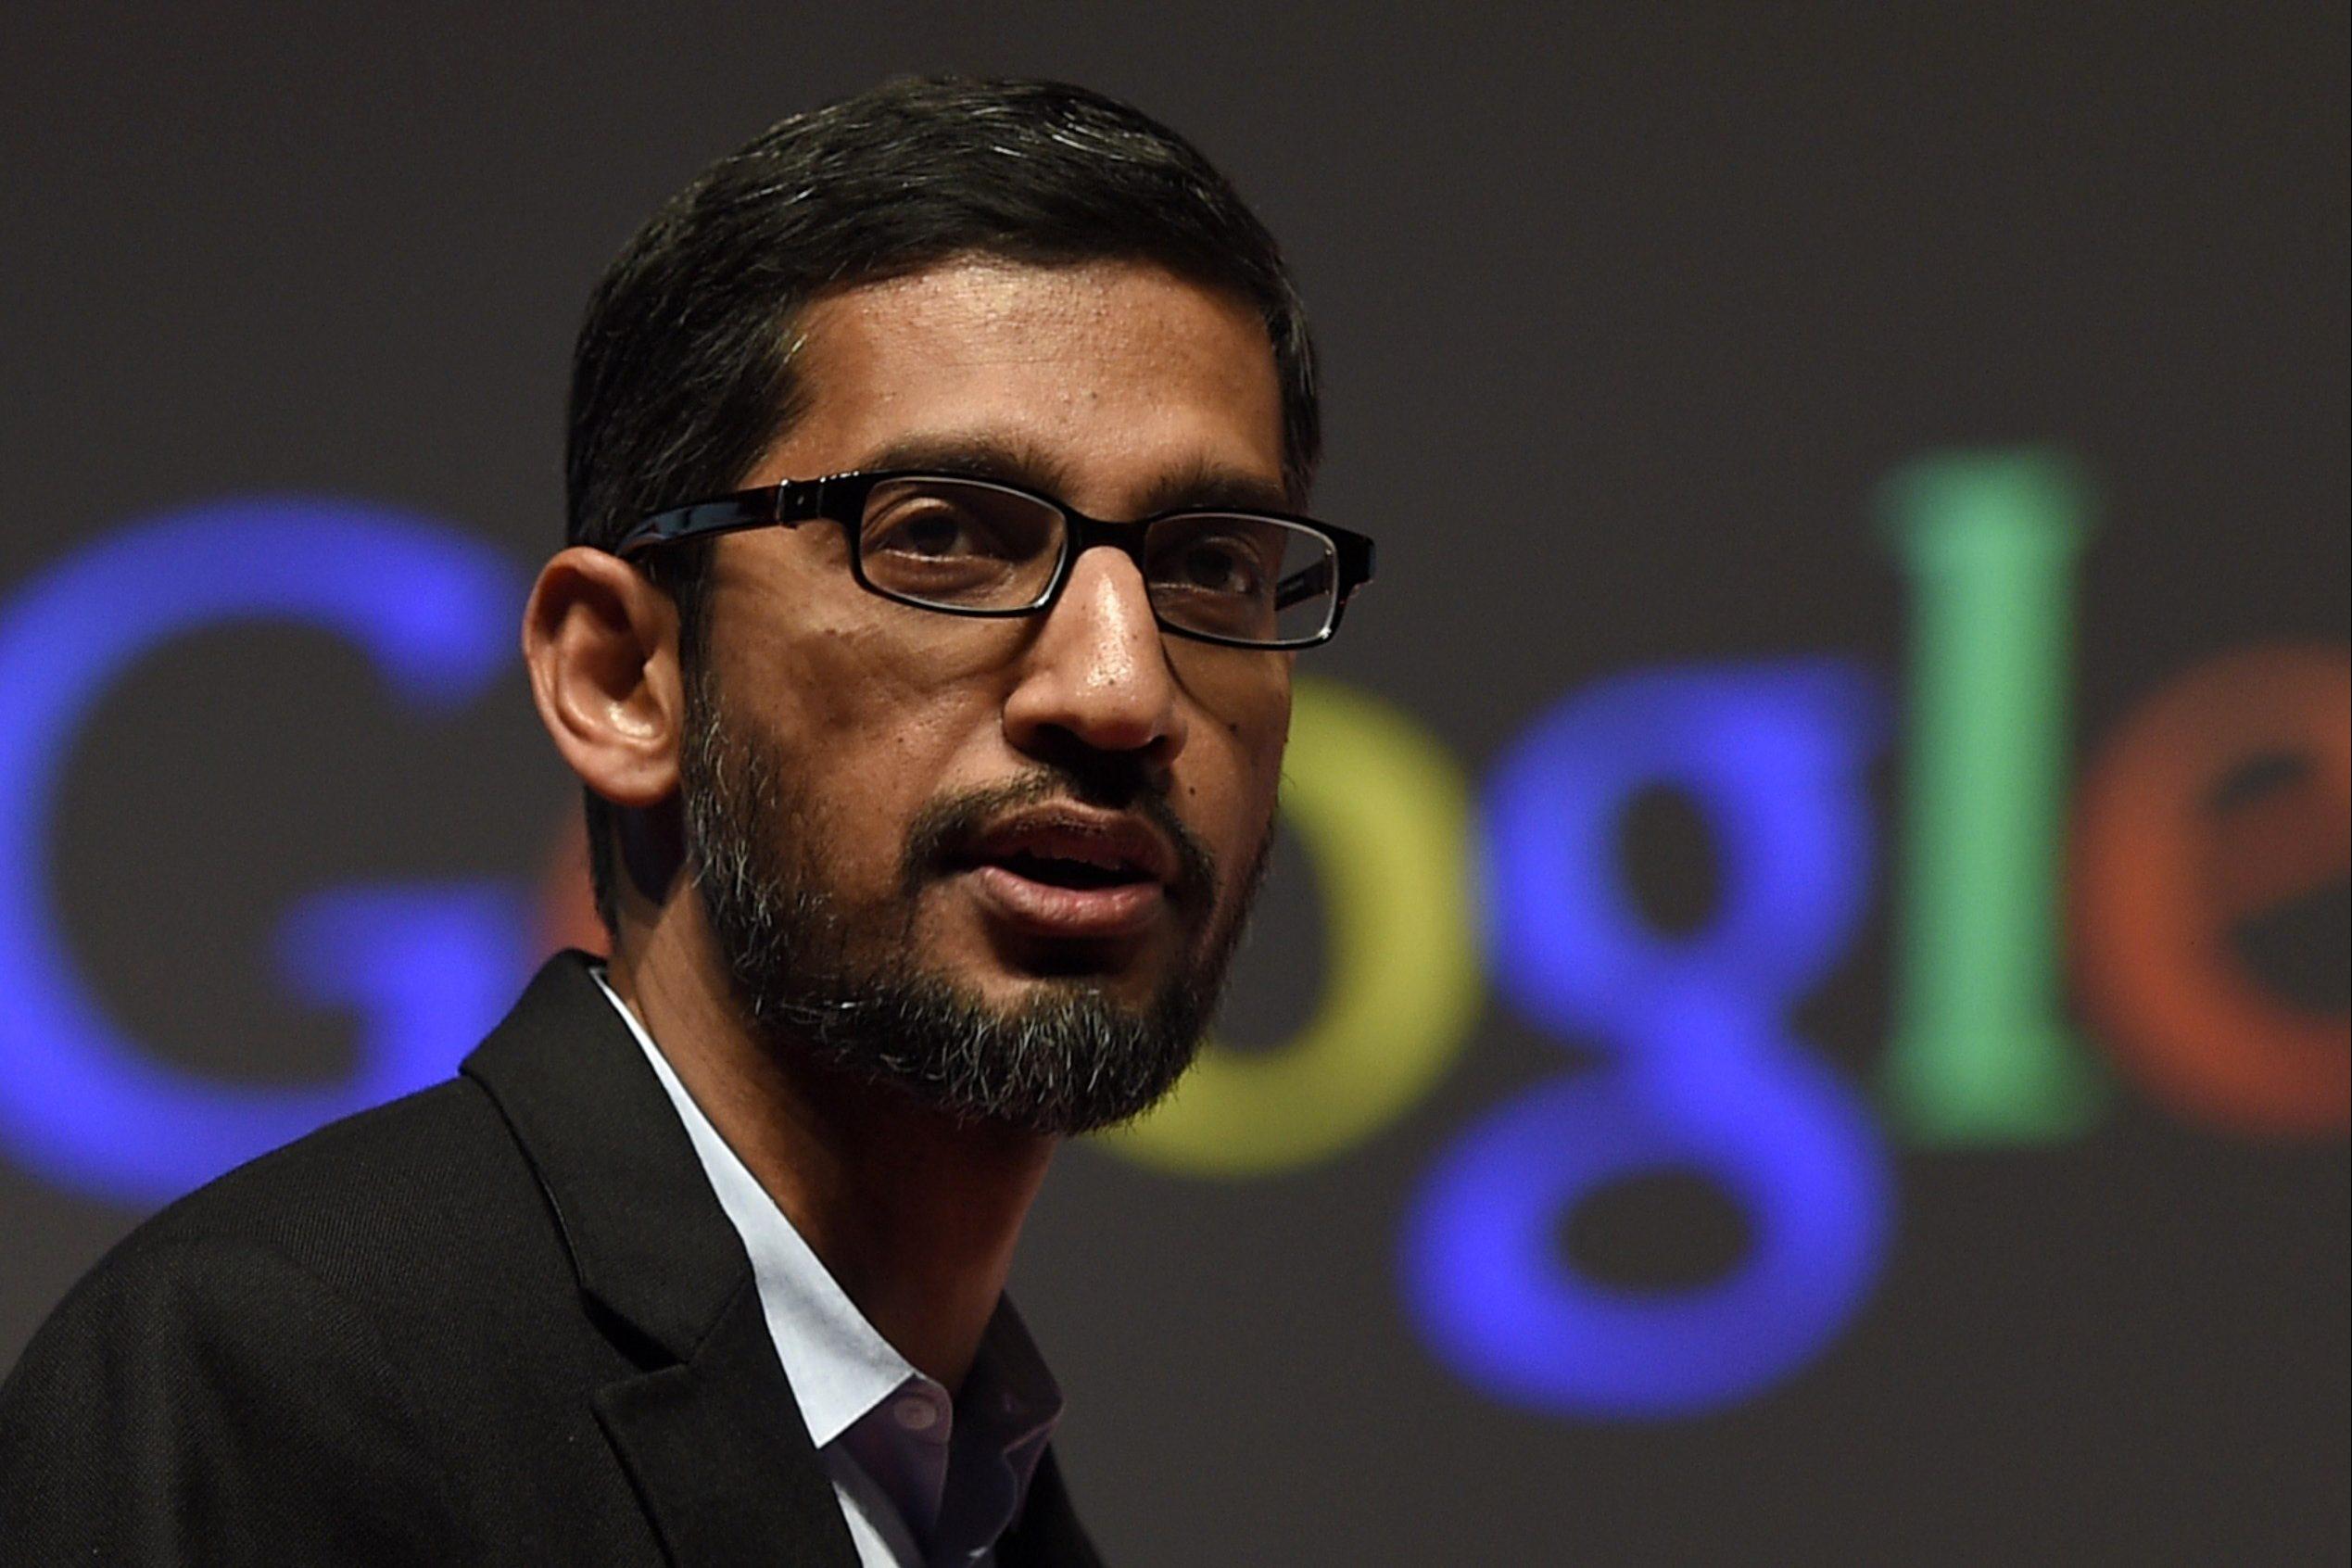 Why Google Doubled CEO Sundar Pichai's Security Allowance in 2018